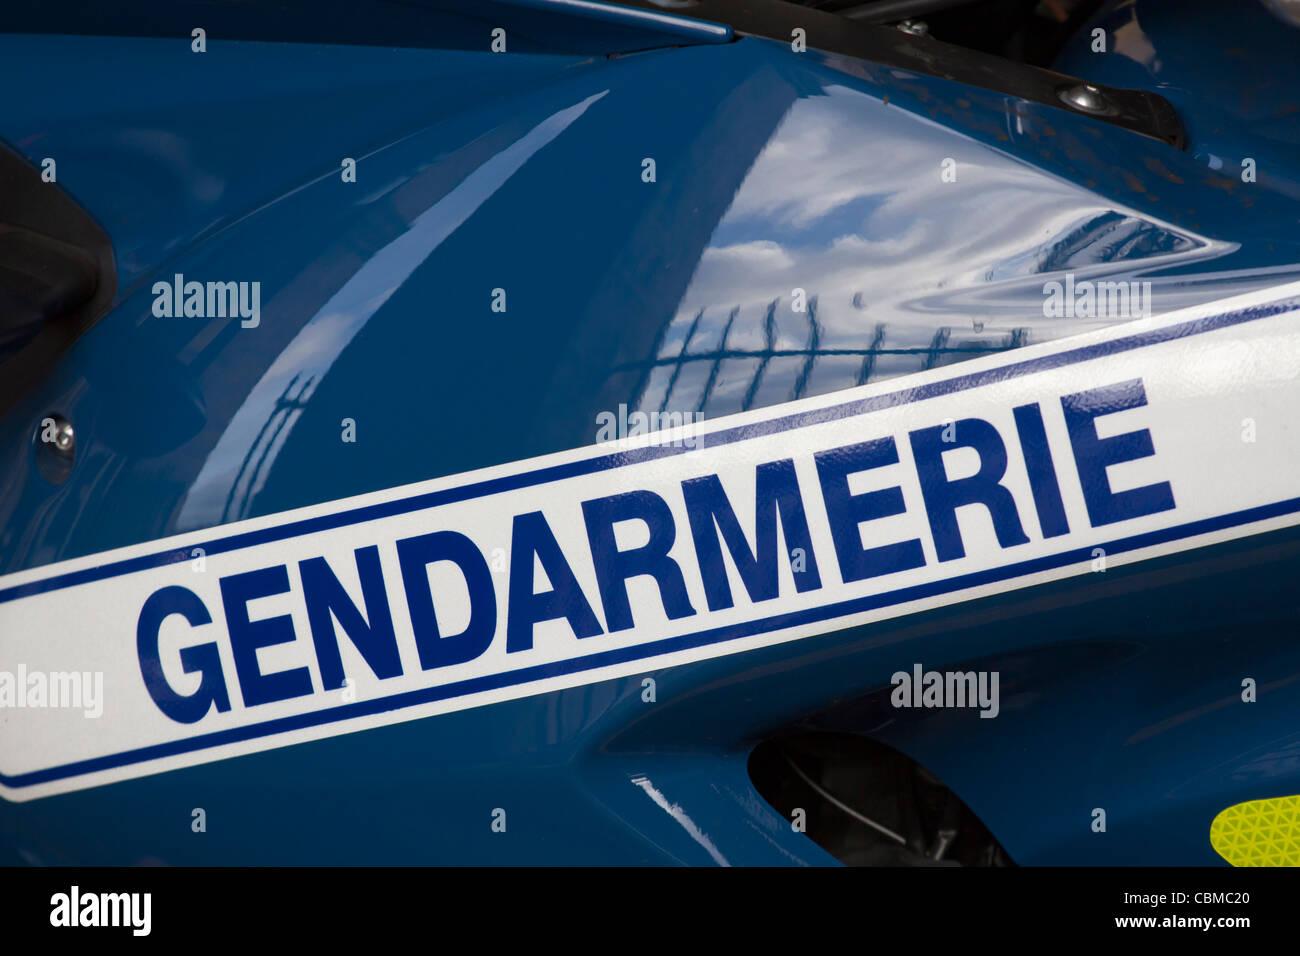 Detail from gendarme's motorbike, Paris, France - Stock Image